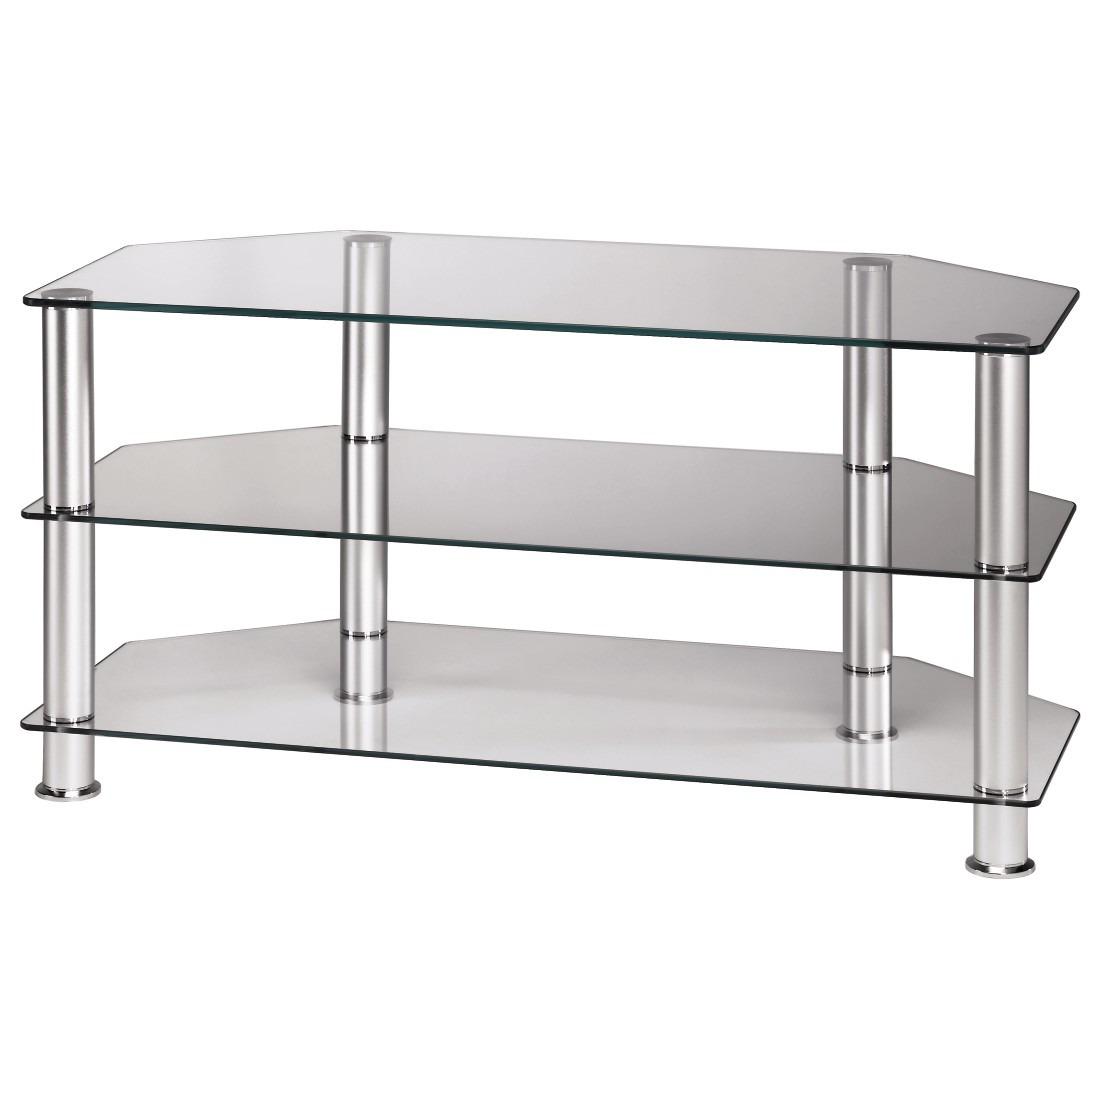 Afbeelding van Hama tv meubel TV meubel 1m 3 boorden aluminium + glas transparant